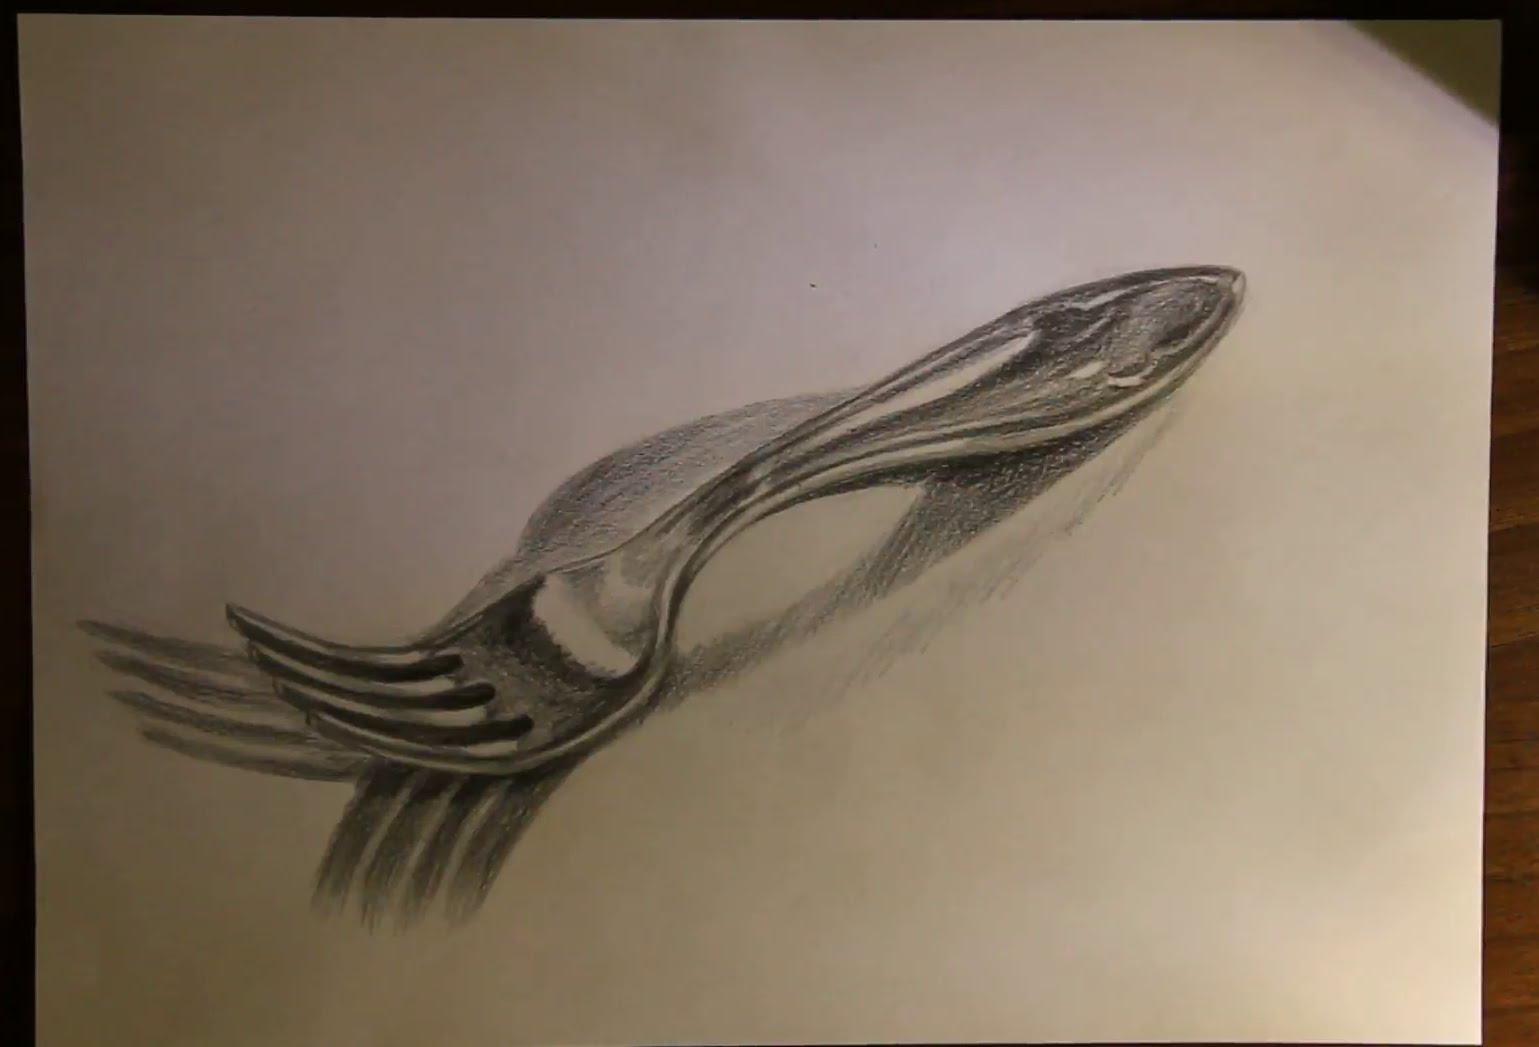 1539x1047 3d Art Drawing